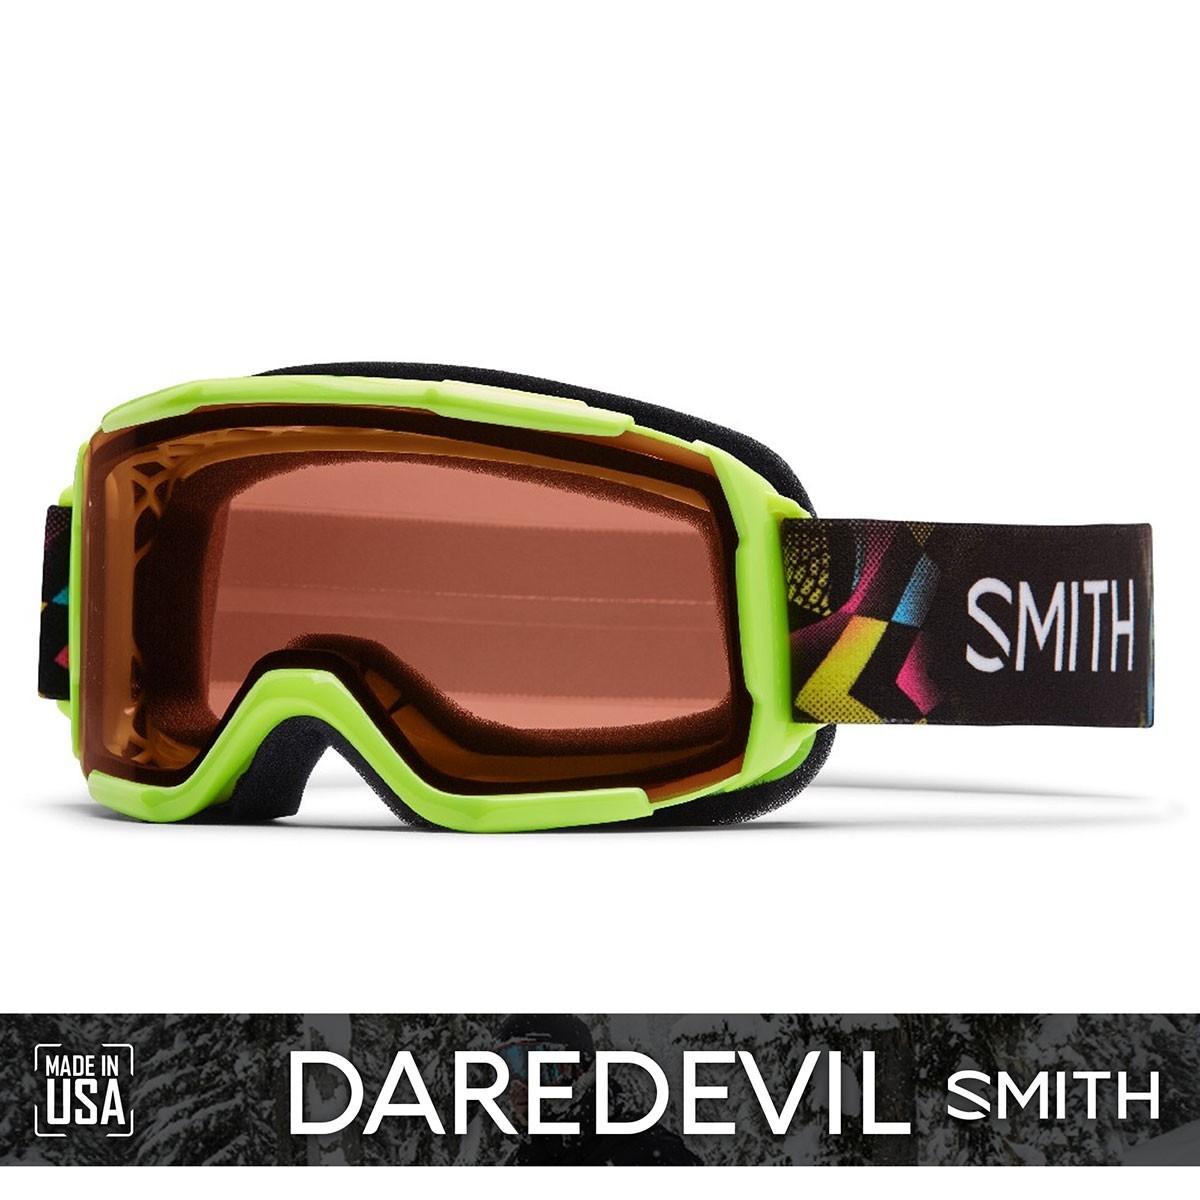 SMITH DAREDEVIL Neon Blacklight | S2 RC36 ROSEC - Изображение - AQUAMATRIX